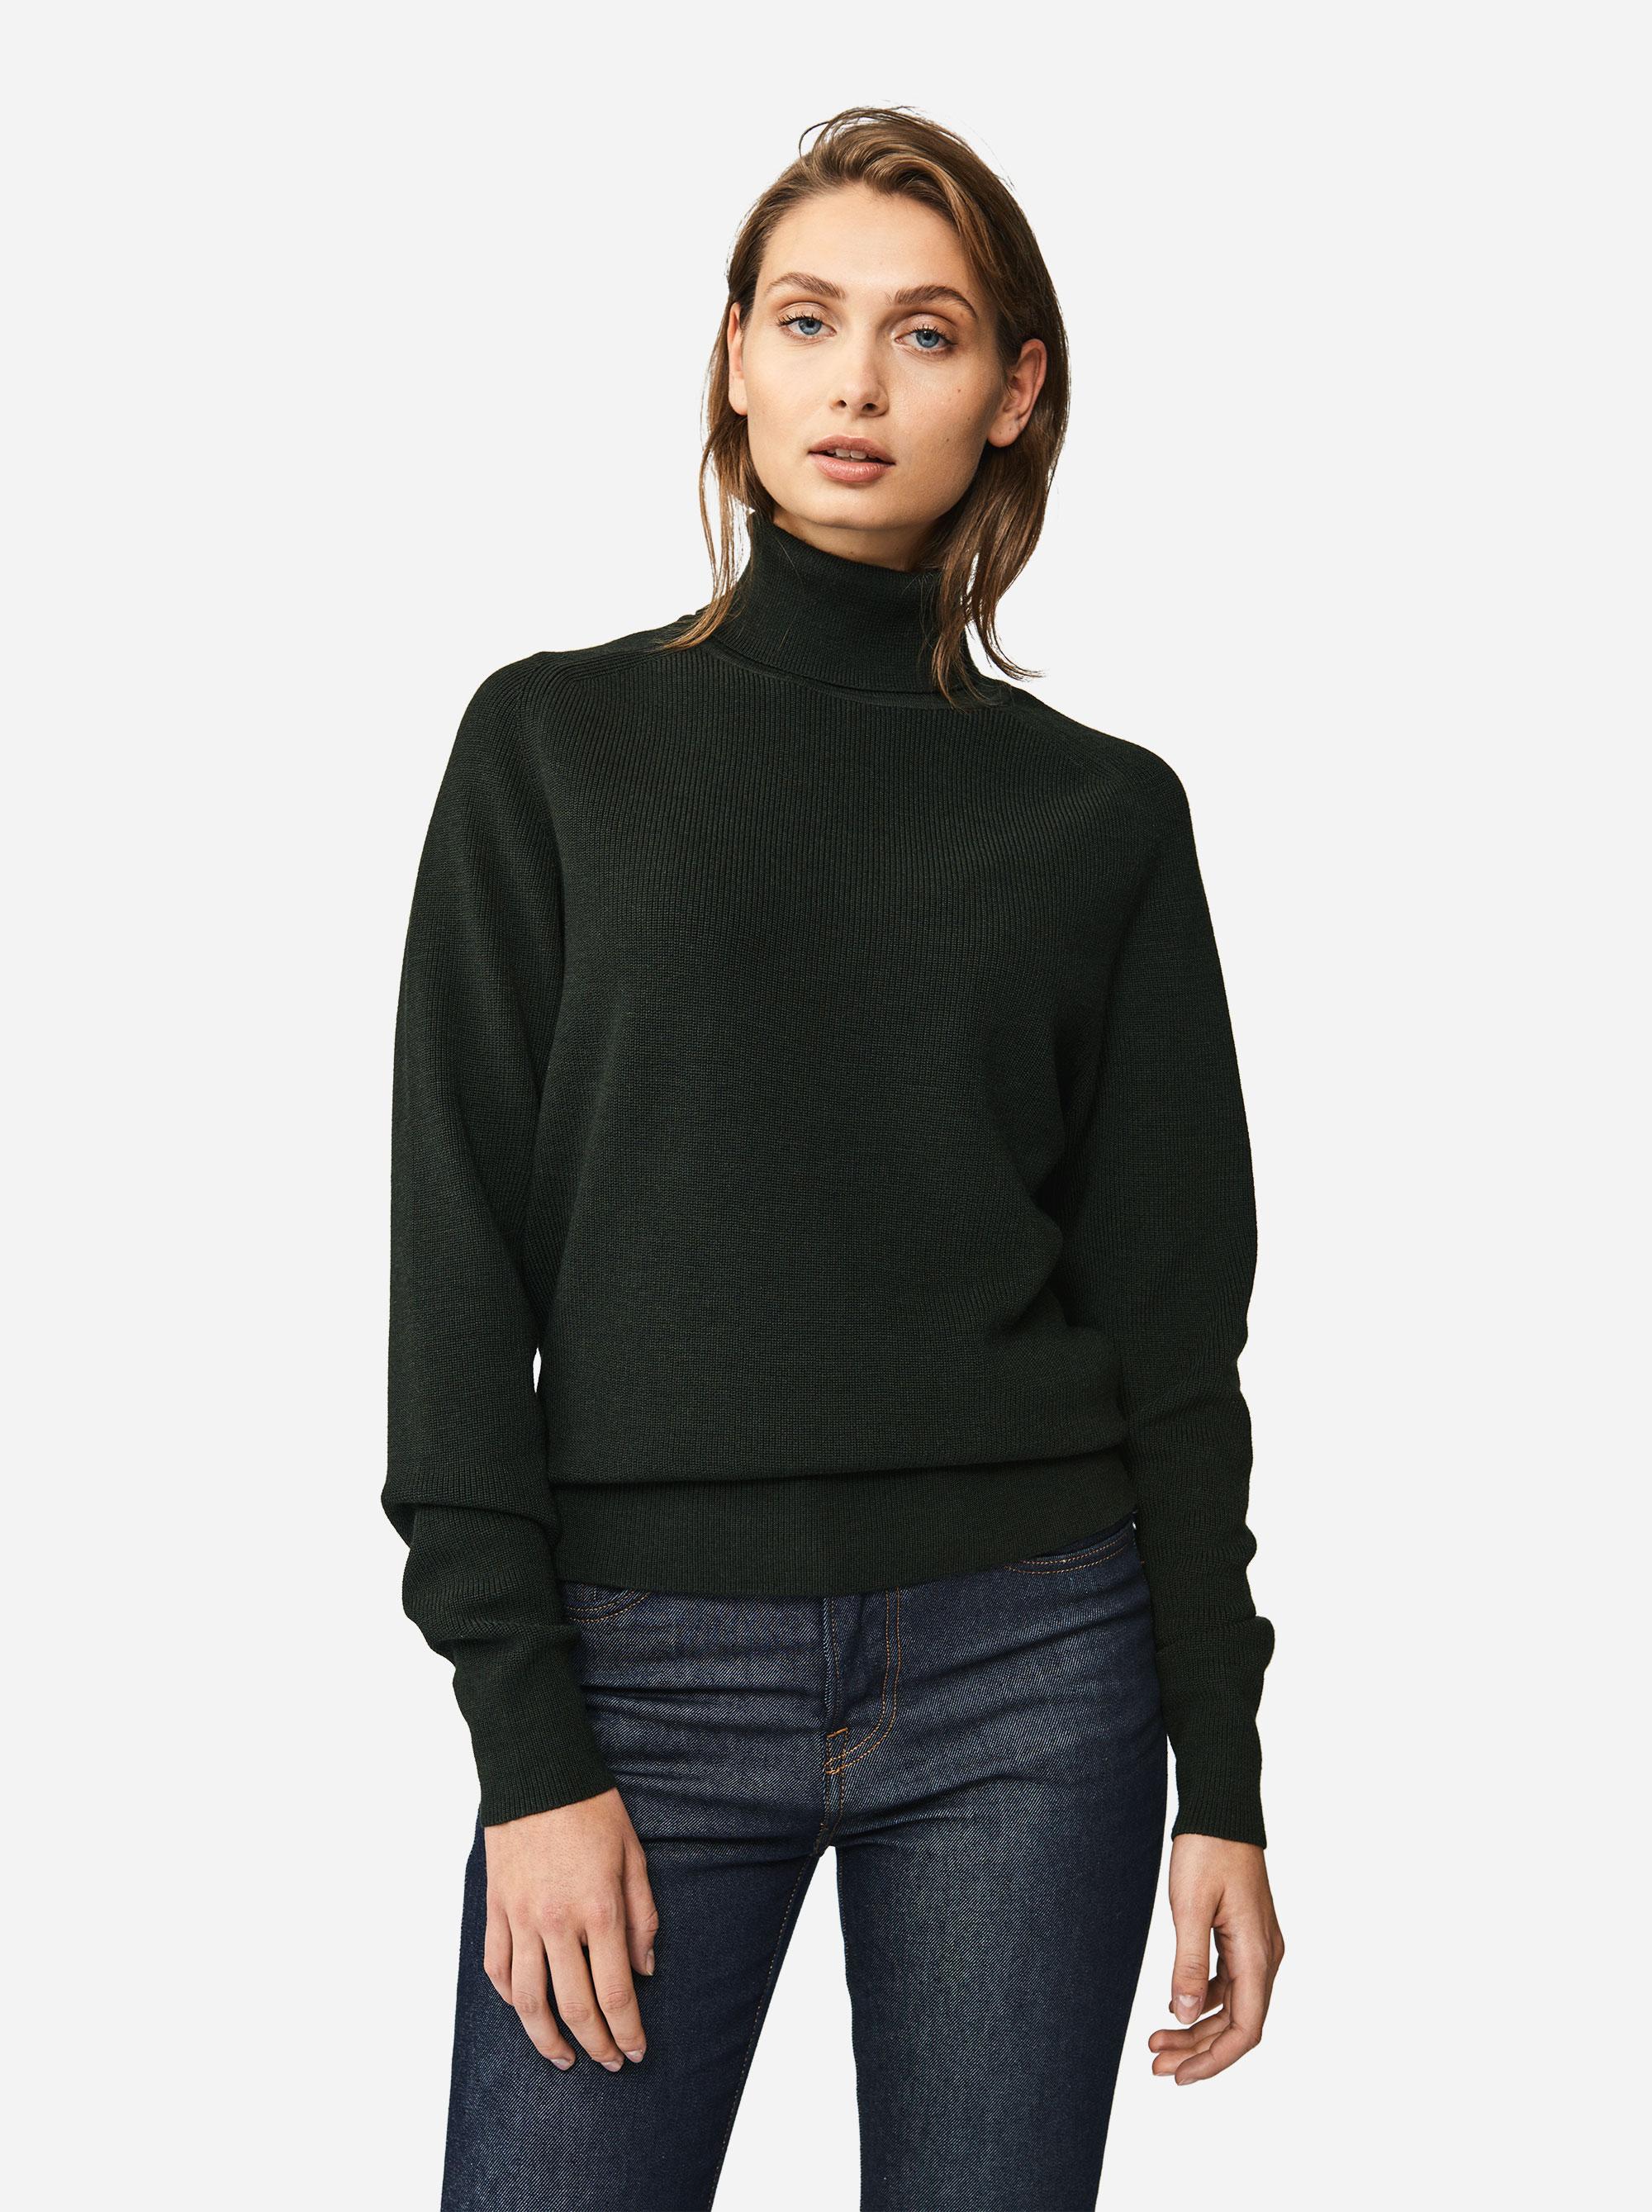 Teym - Turtleneck - The Merino Sweater - Women - Green - 2